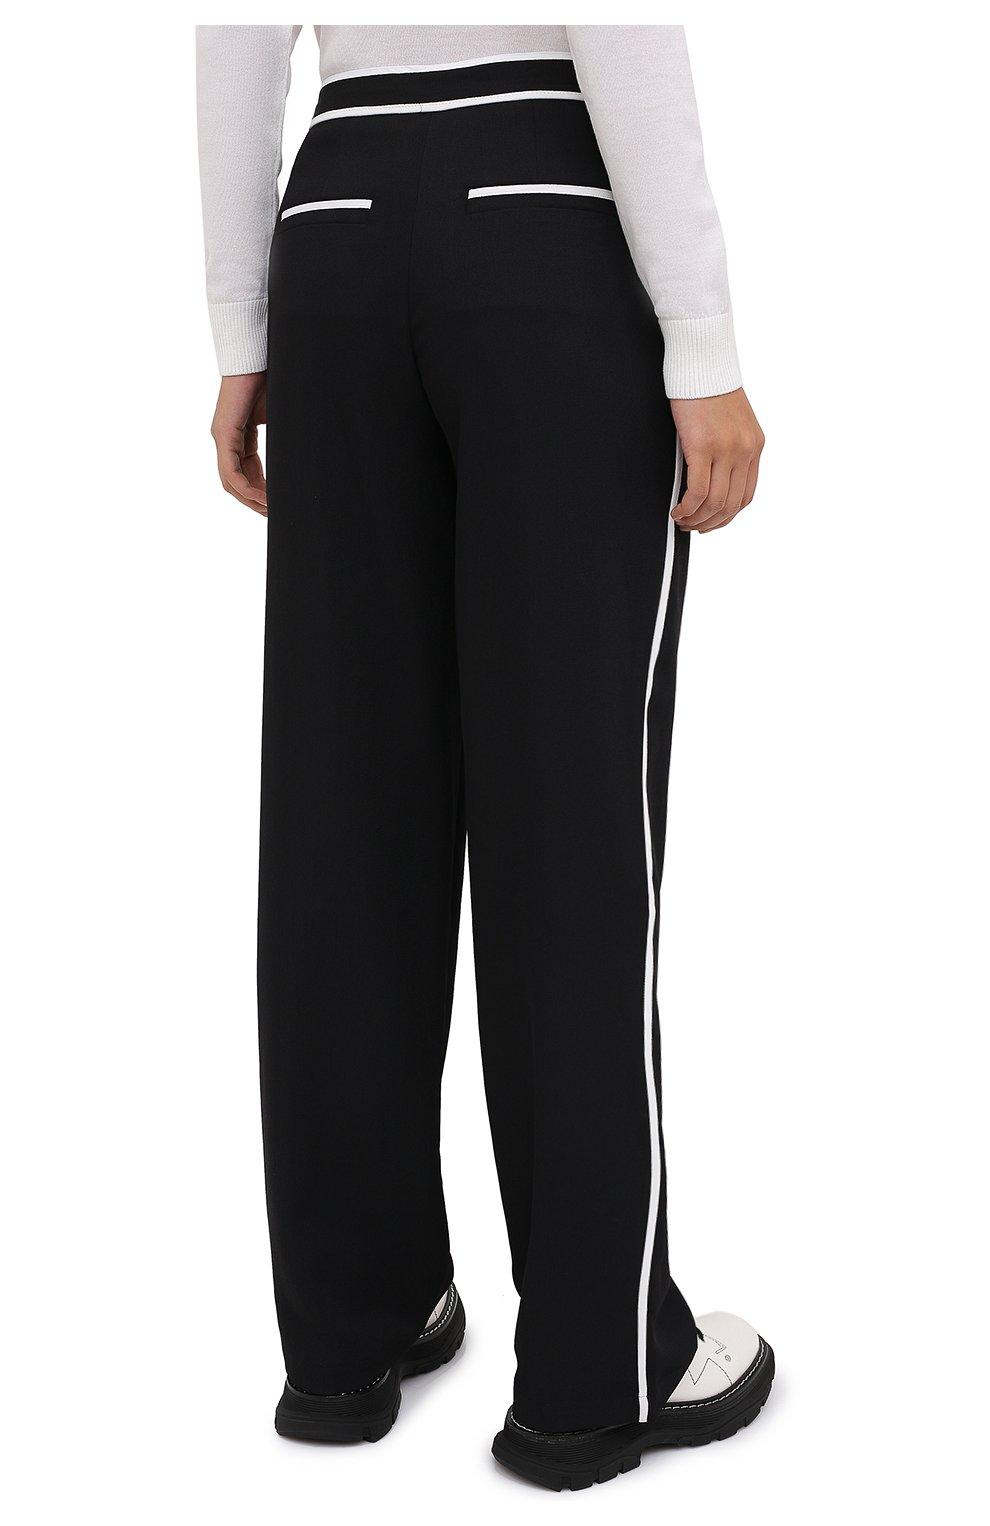 Женские брюки PROENZA SCHOULER WHITE LABEL черного цвета, арт. WL2036016-BY169   Фото 4